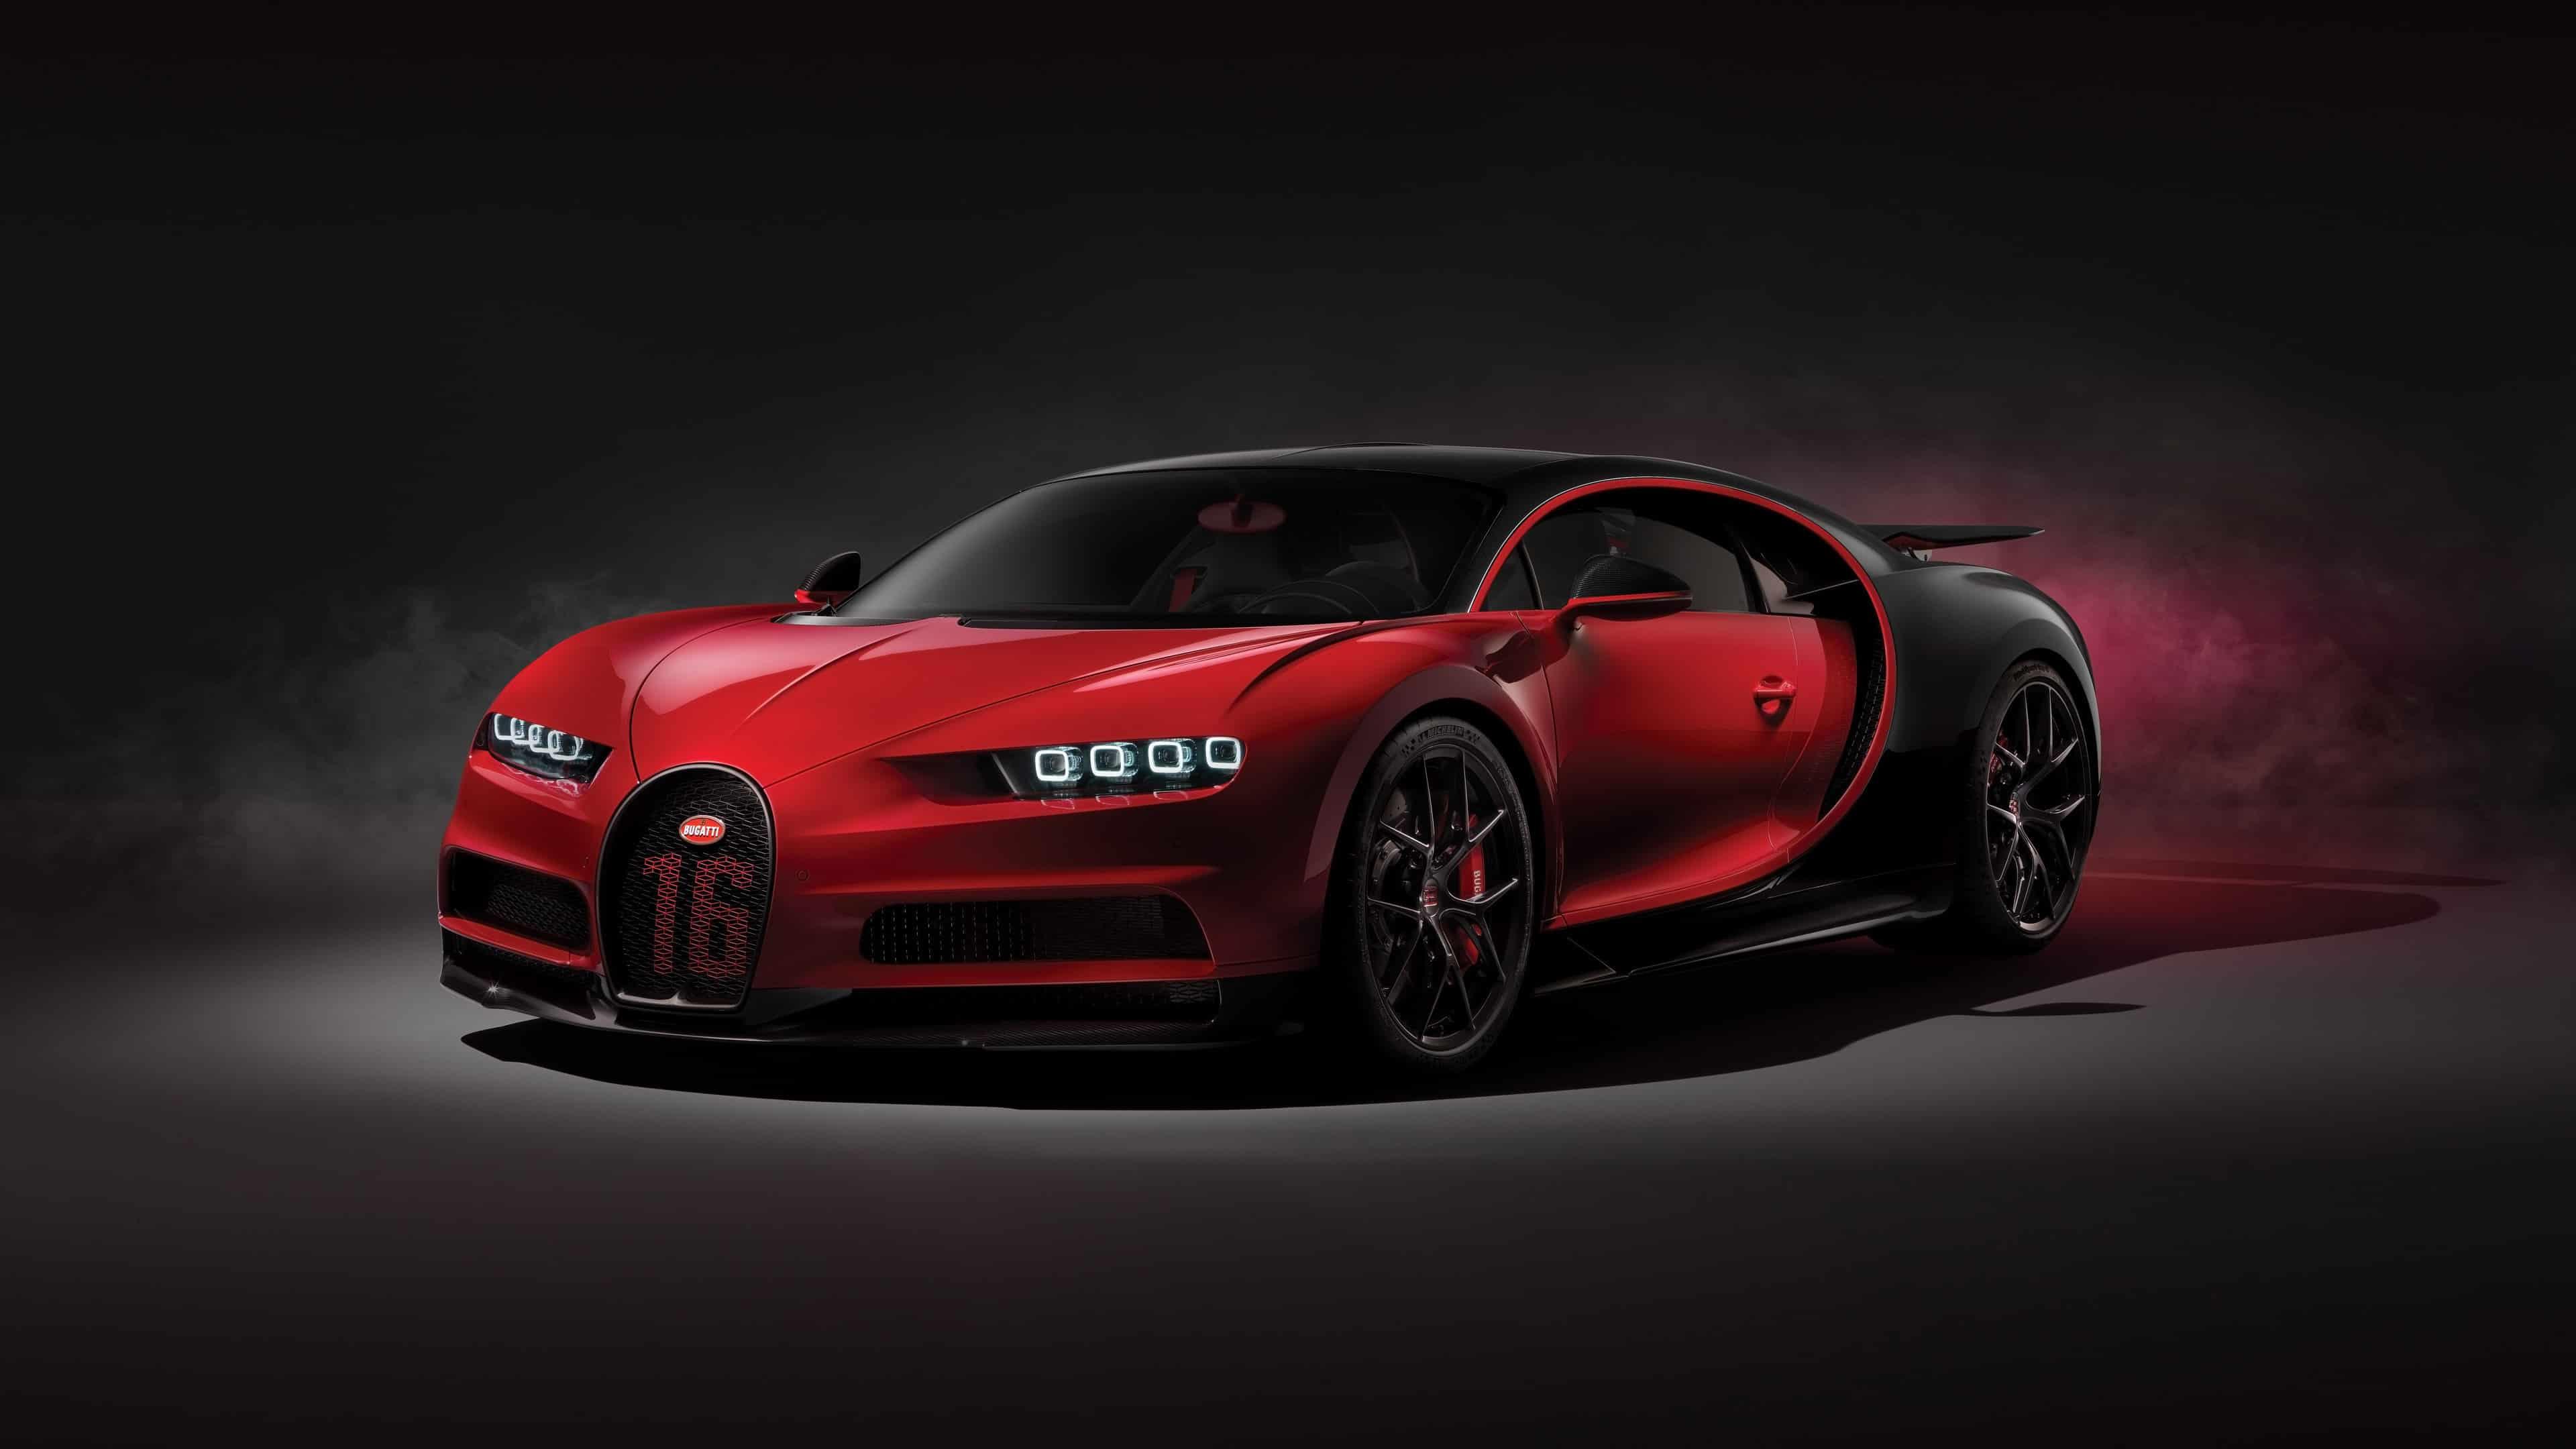 bugatti chiron sport red uhd 4k wallpaper